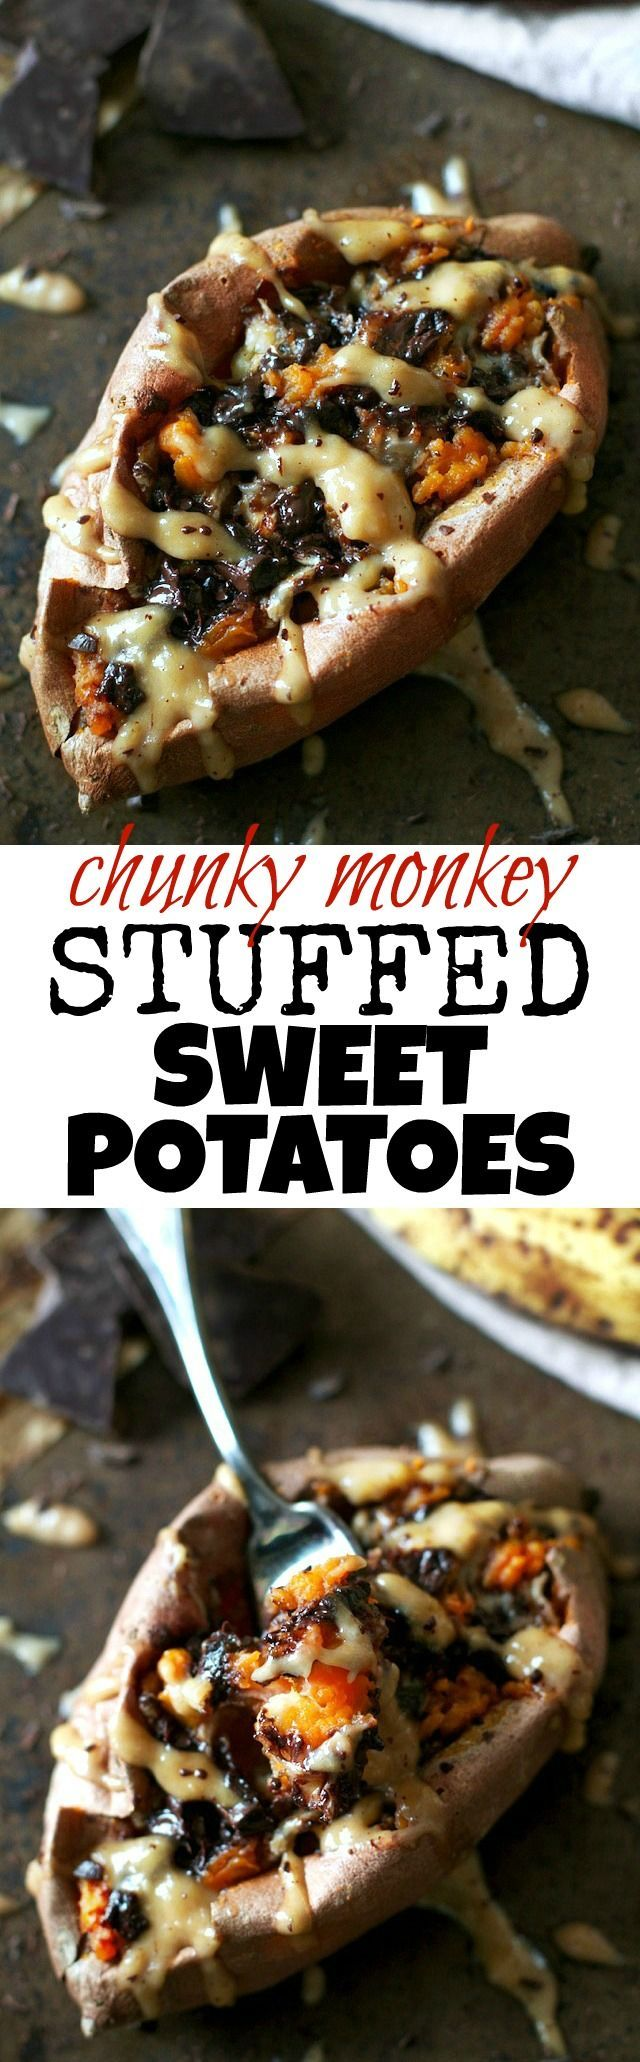 Chunky Monkey Stuffed Sweet Potatoes   running with spoons